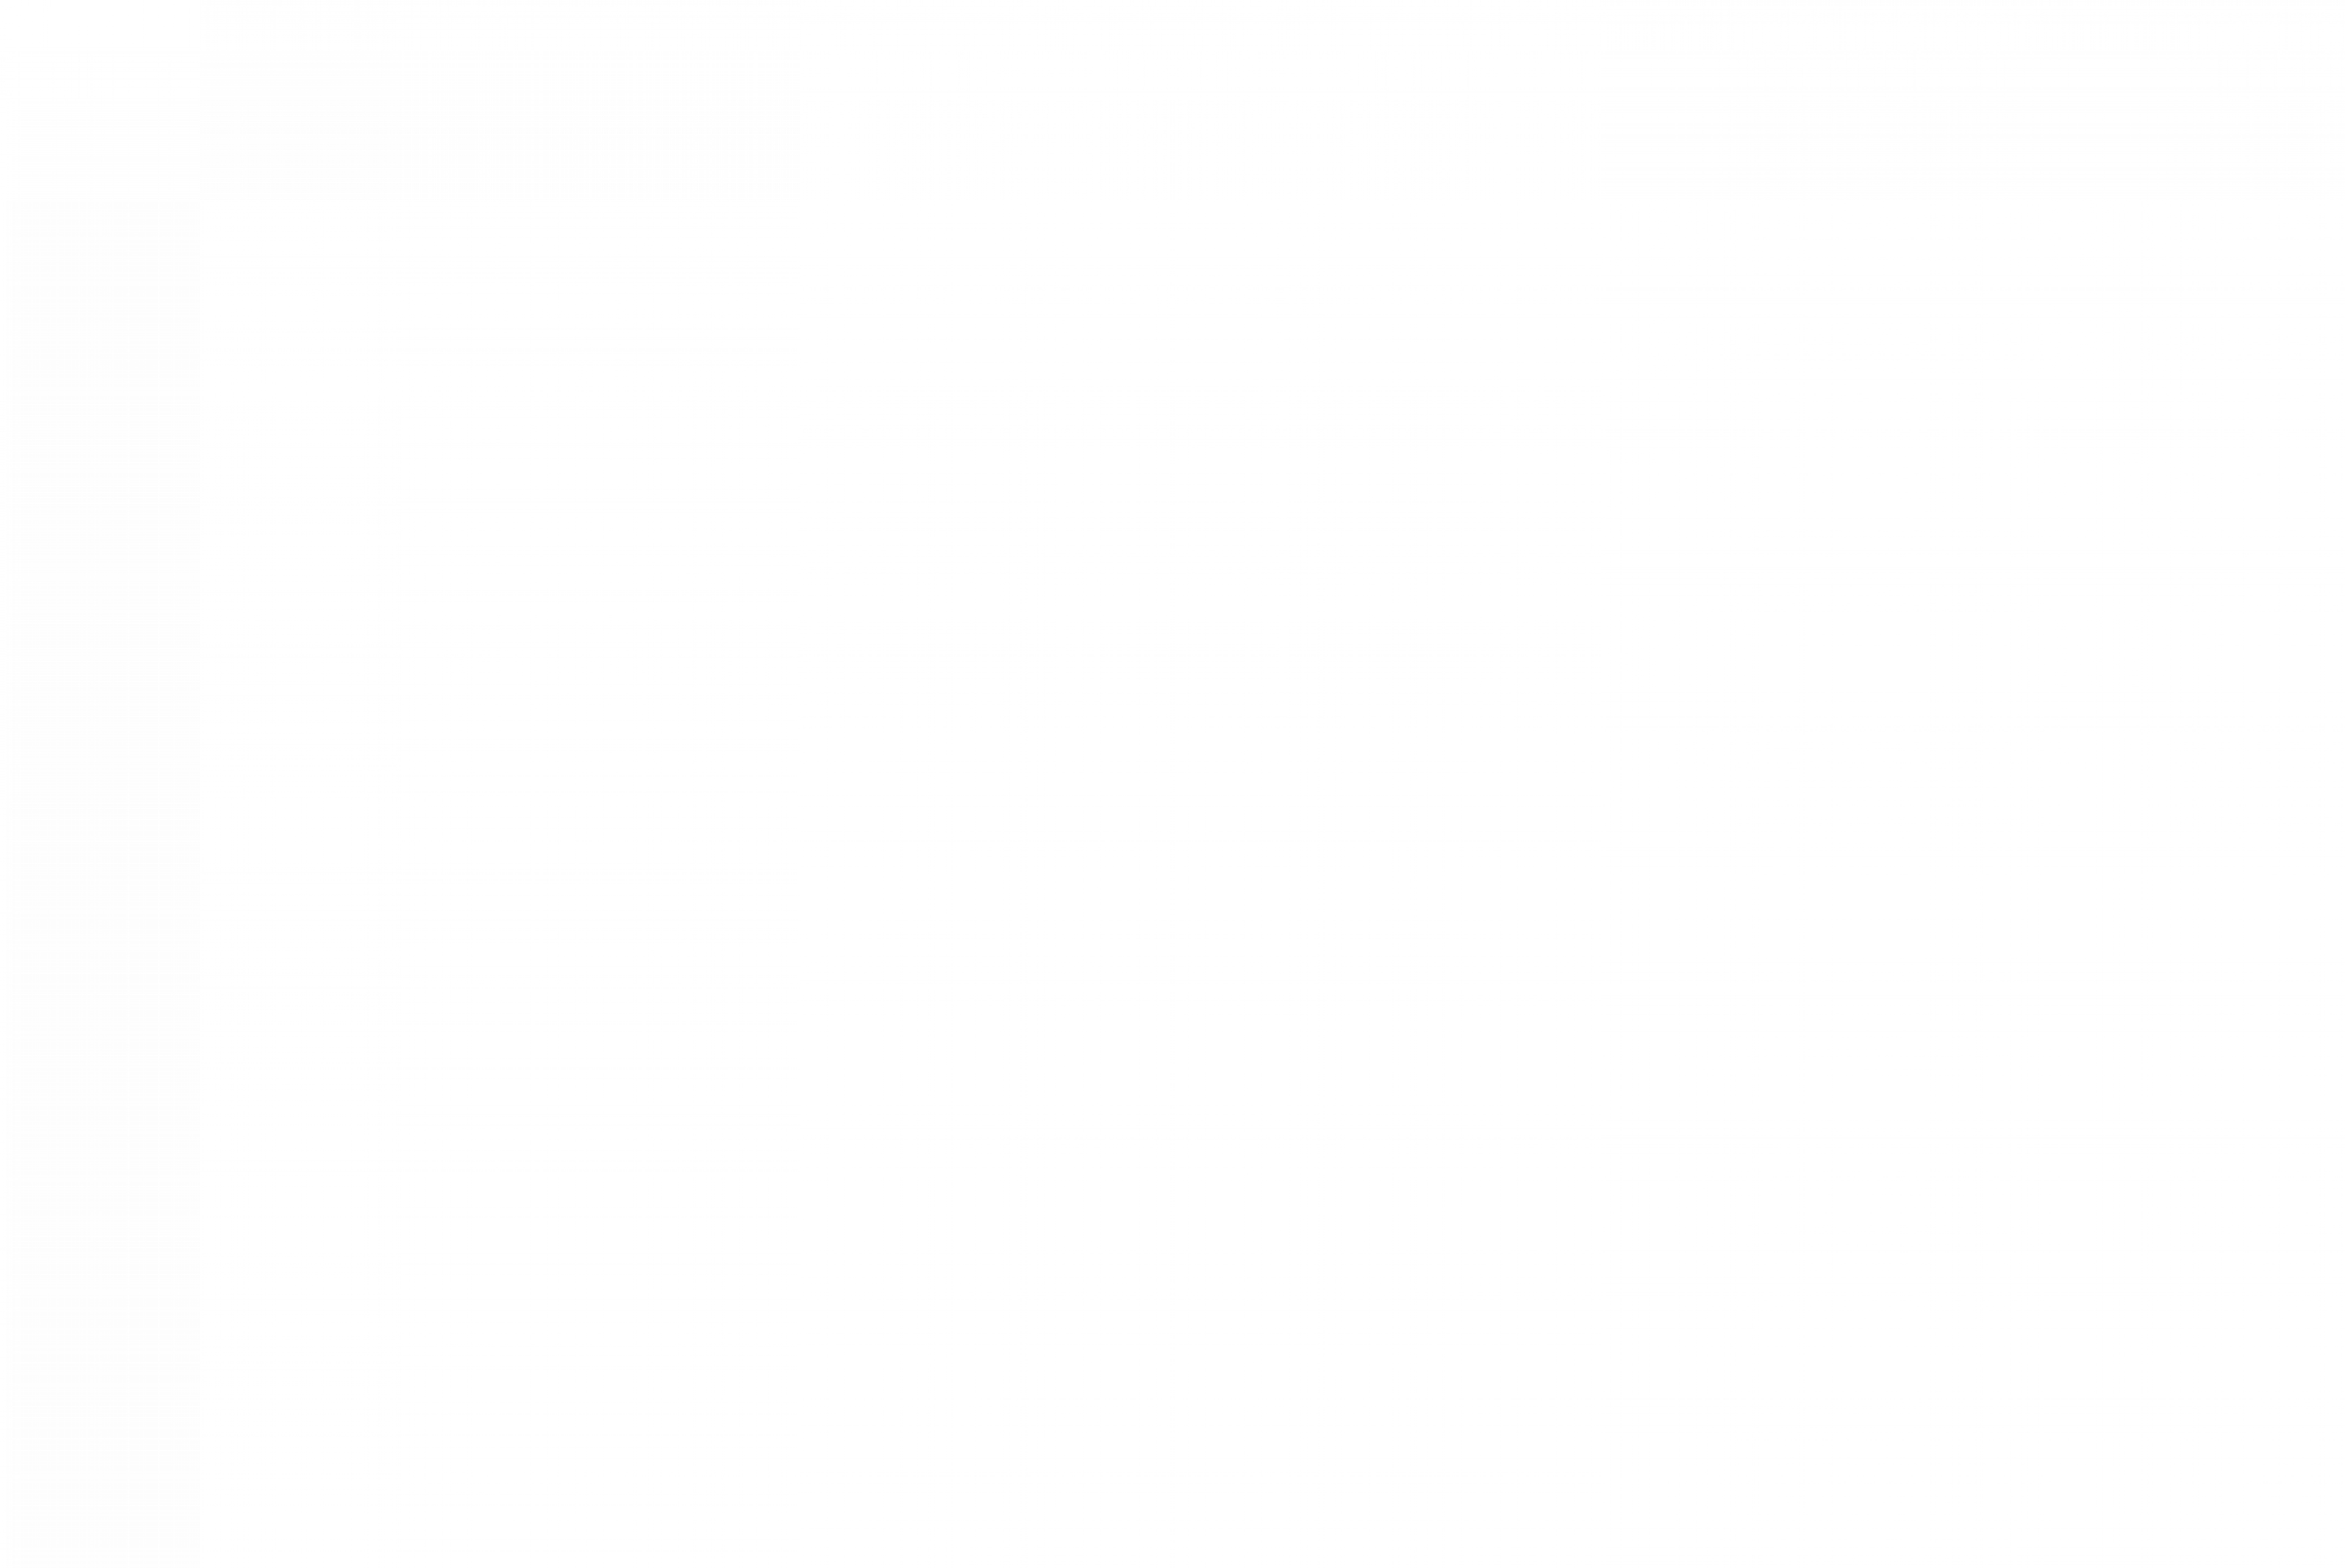 RIDASCREEN® Bacitracin: Quantitative Screening of Bacitracin